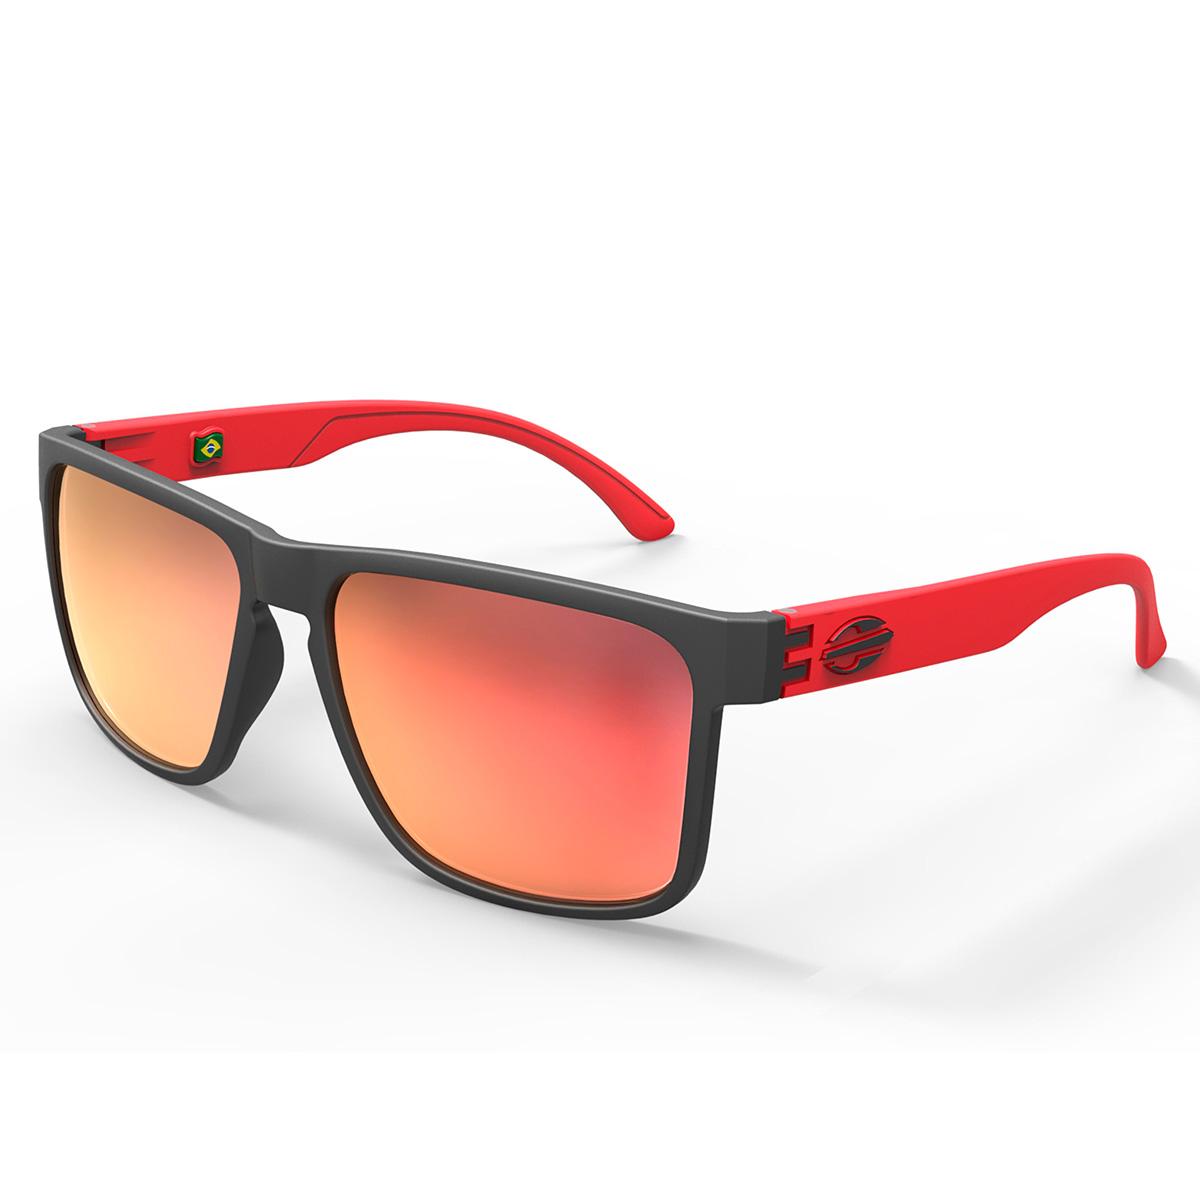 Óculos de Sol Mormaii Monterey M0029A8211MormaiiMormaii de SolCompra ... 3c71f3a37a